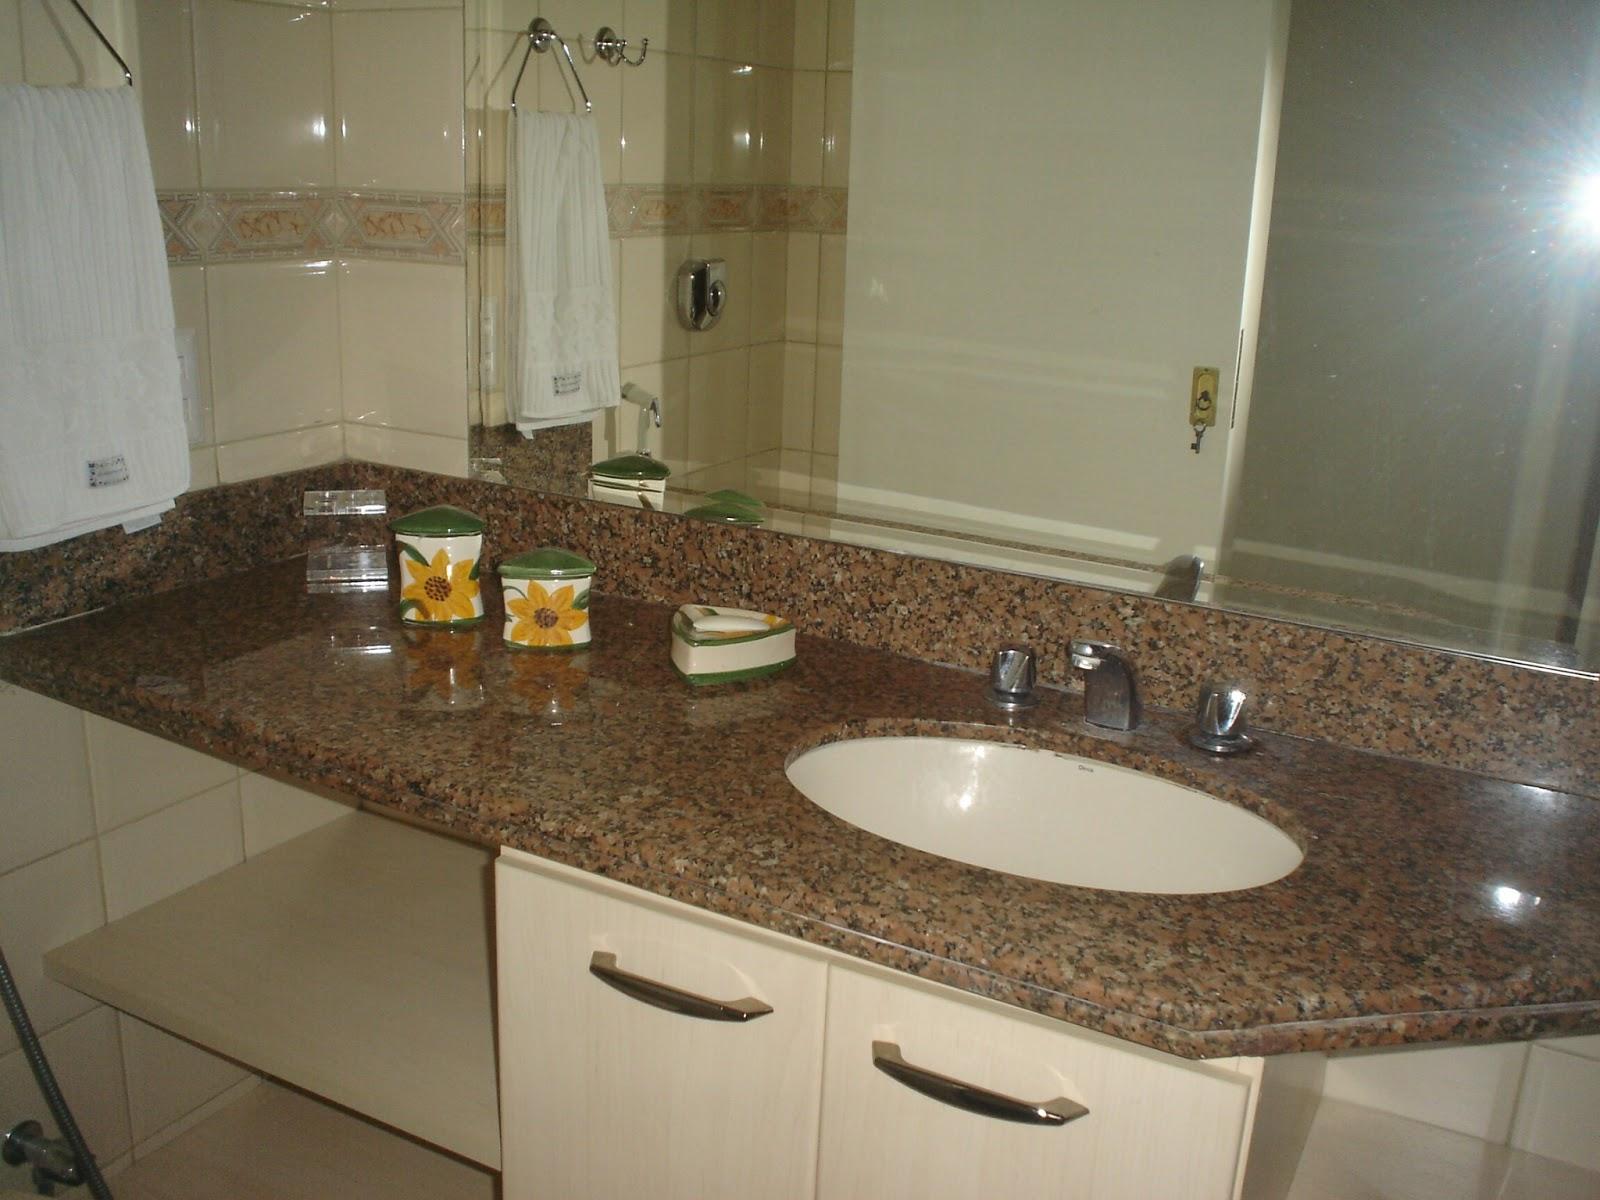 Excelente Apartamento no Recreio dos Bandeirantes RJ: Outubro 2014 #A97B22 1600x1200 Bancada Banheiro Rj